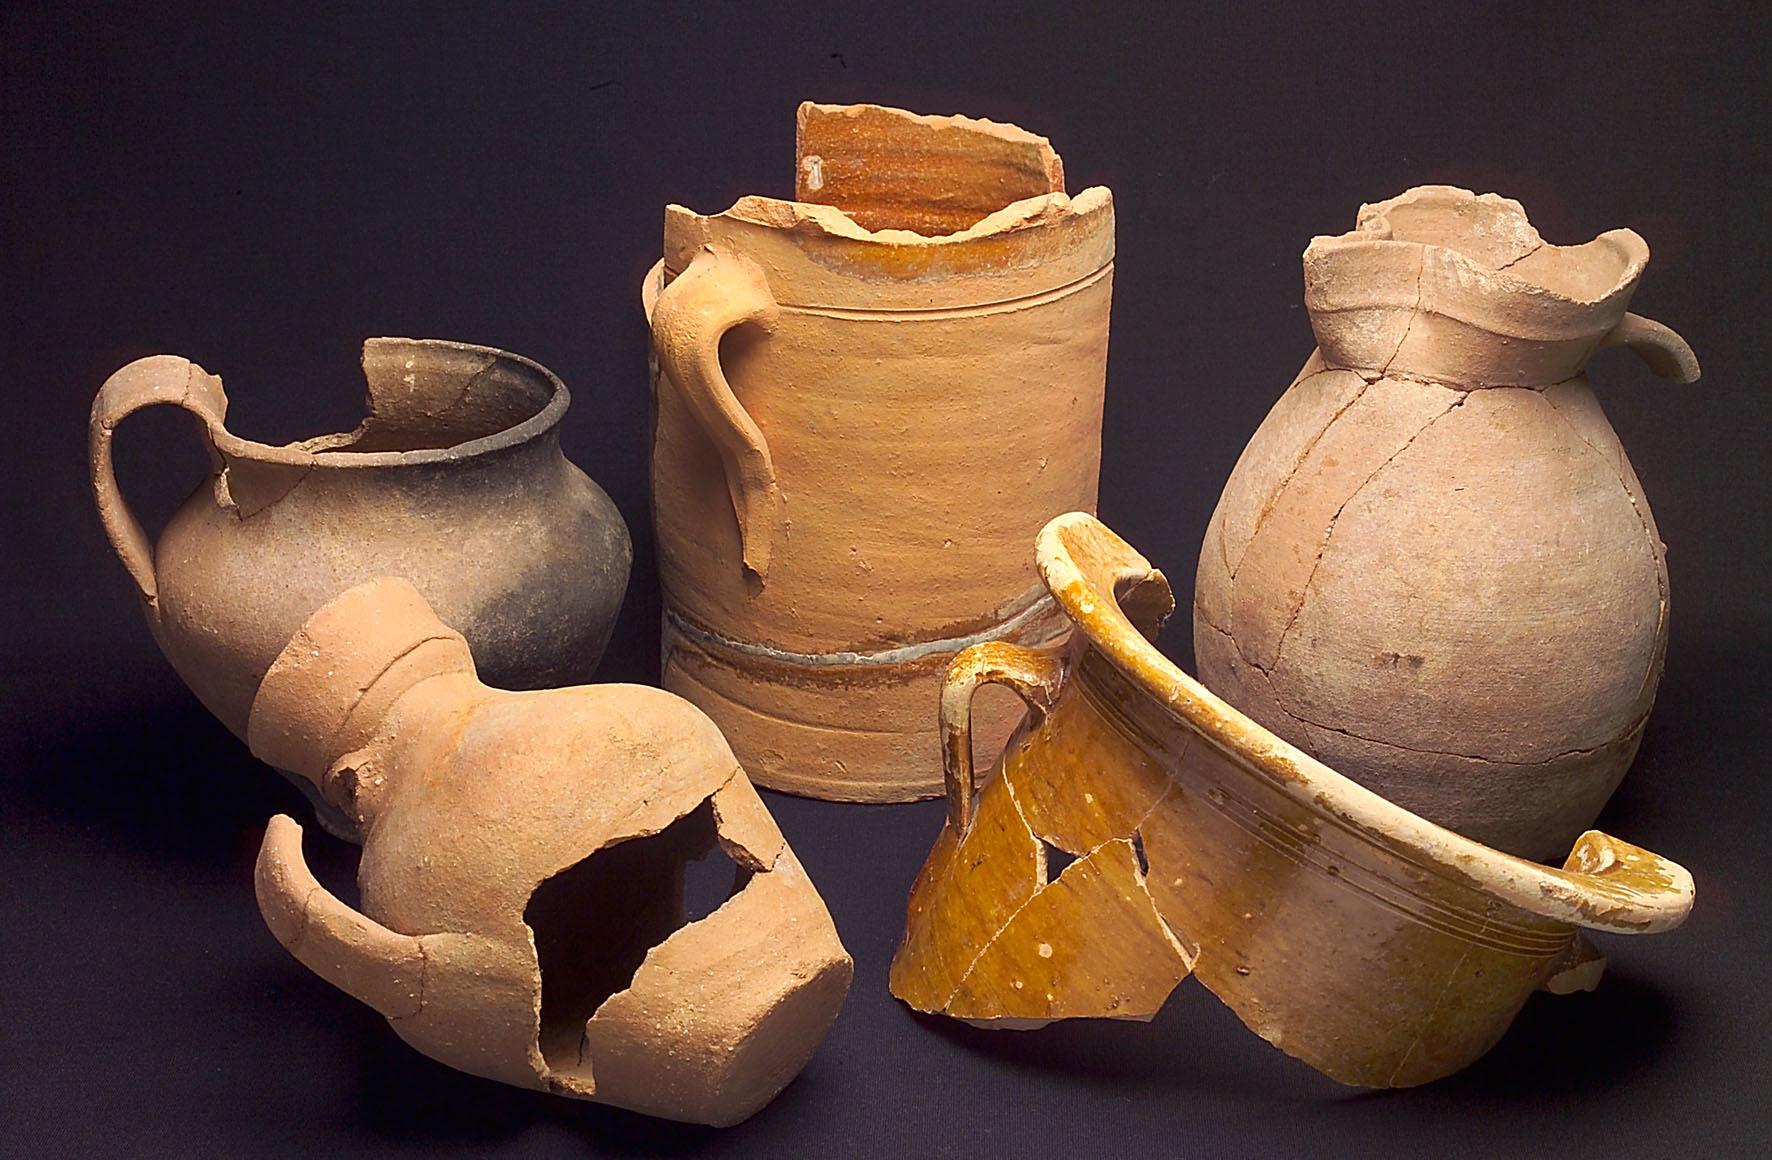 soñar con ceramica